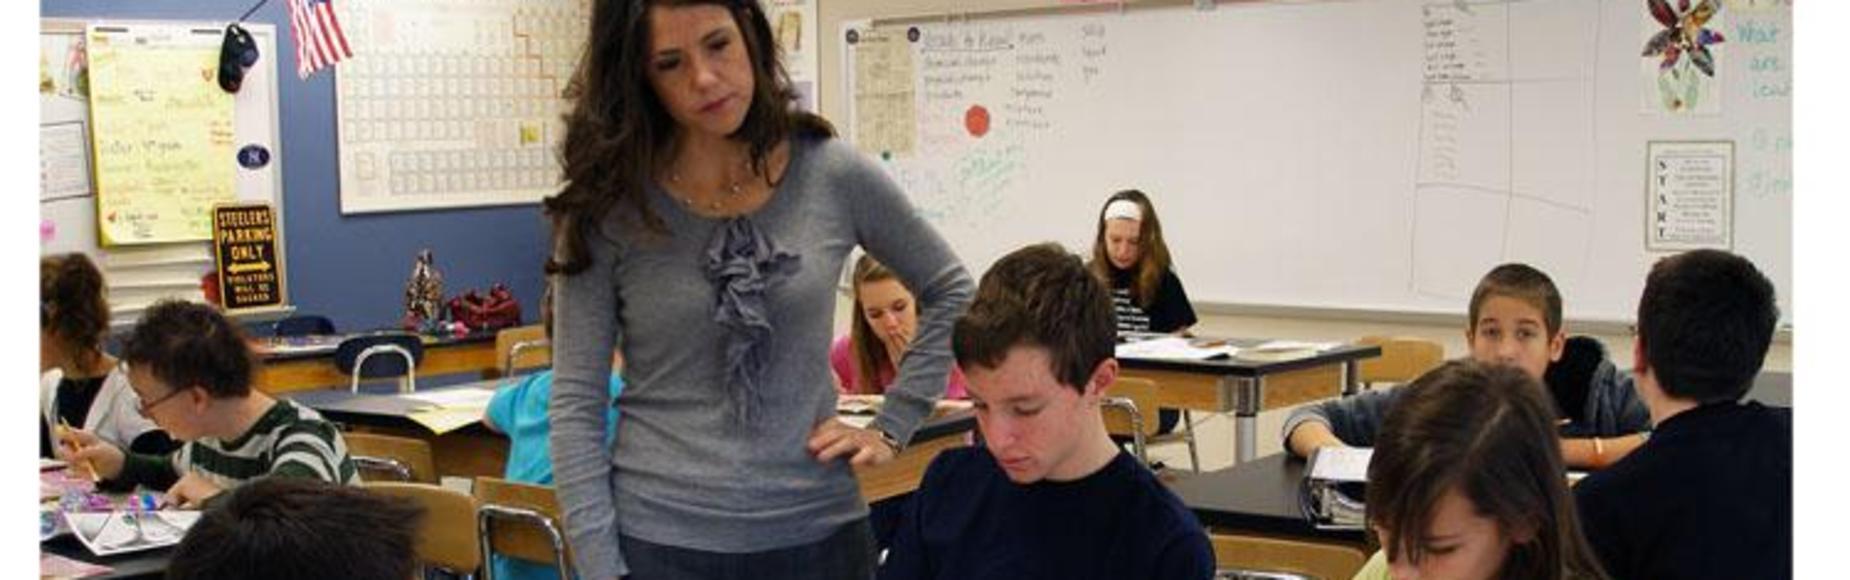 Teacher standing picture